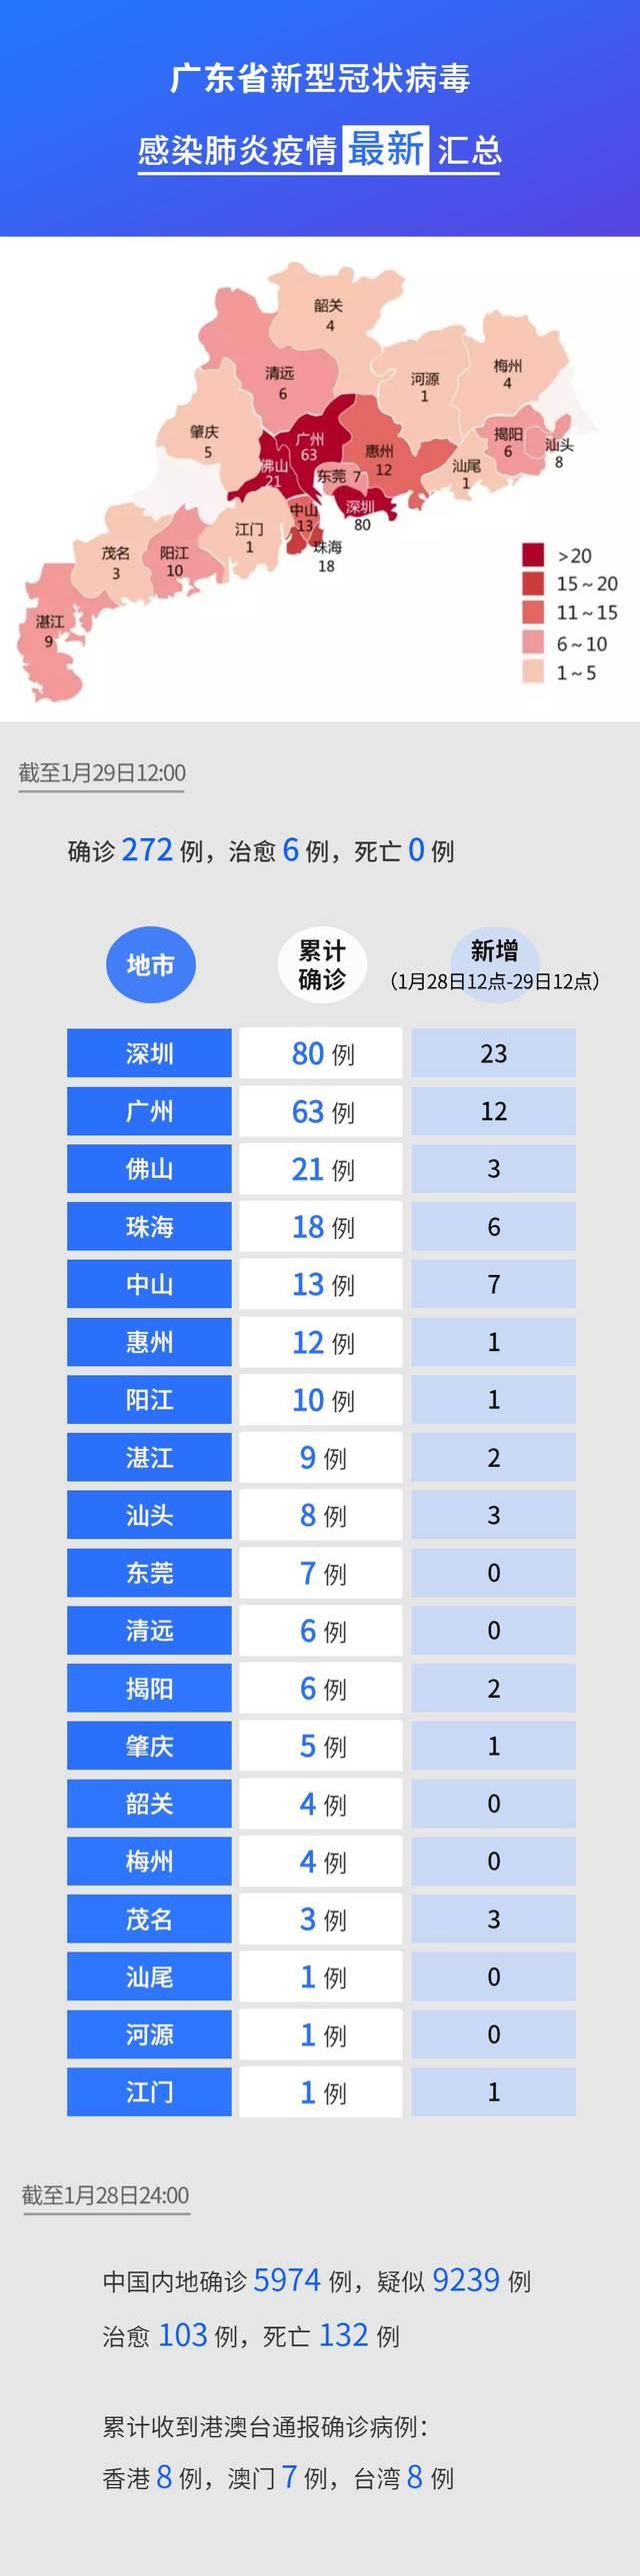 http://www.szminfu.com/shenzhenxinwen/39436.html